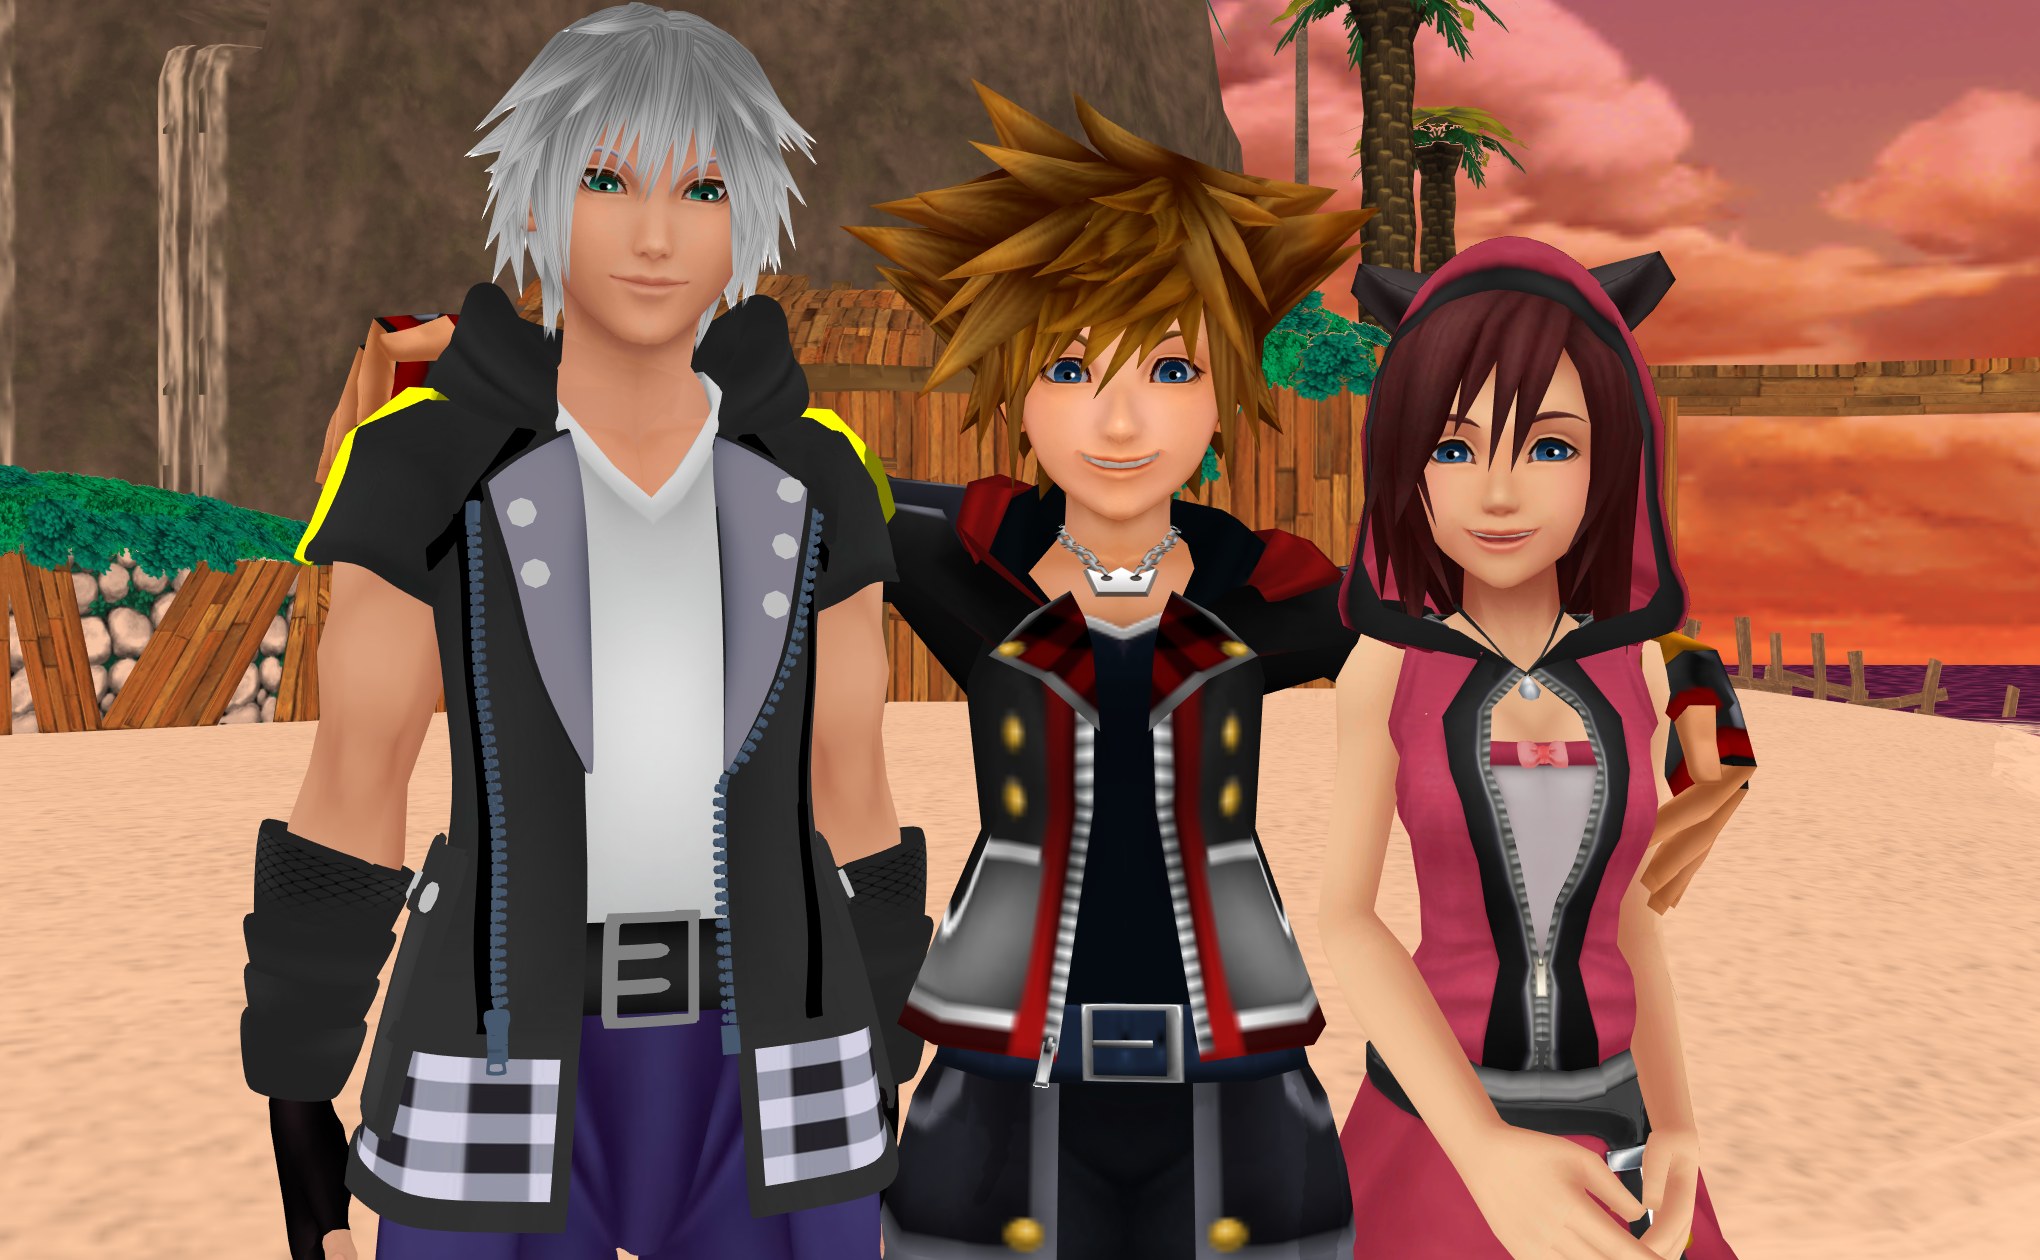 Kingdom Hearts Trios Afbeeldingen The Destiny Trios In Kh3 Sora Riku